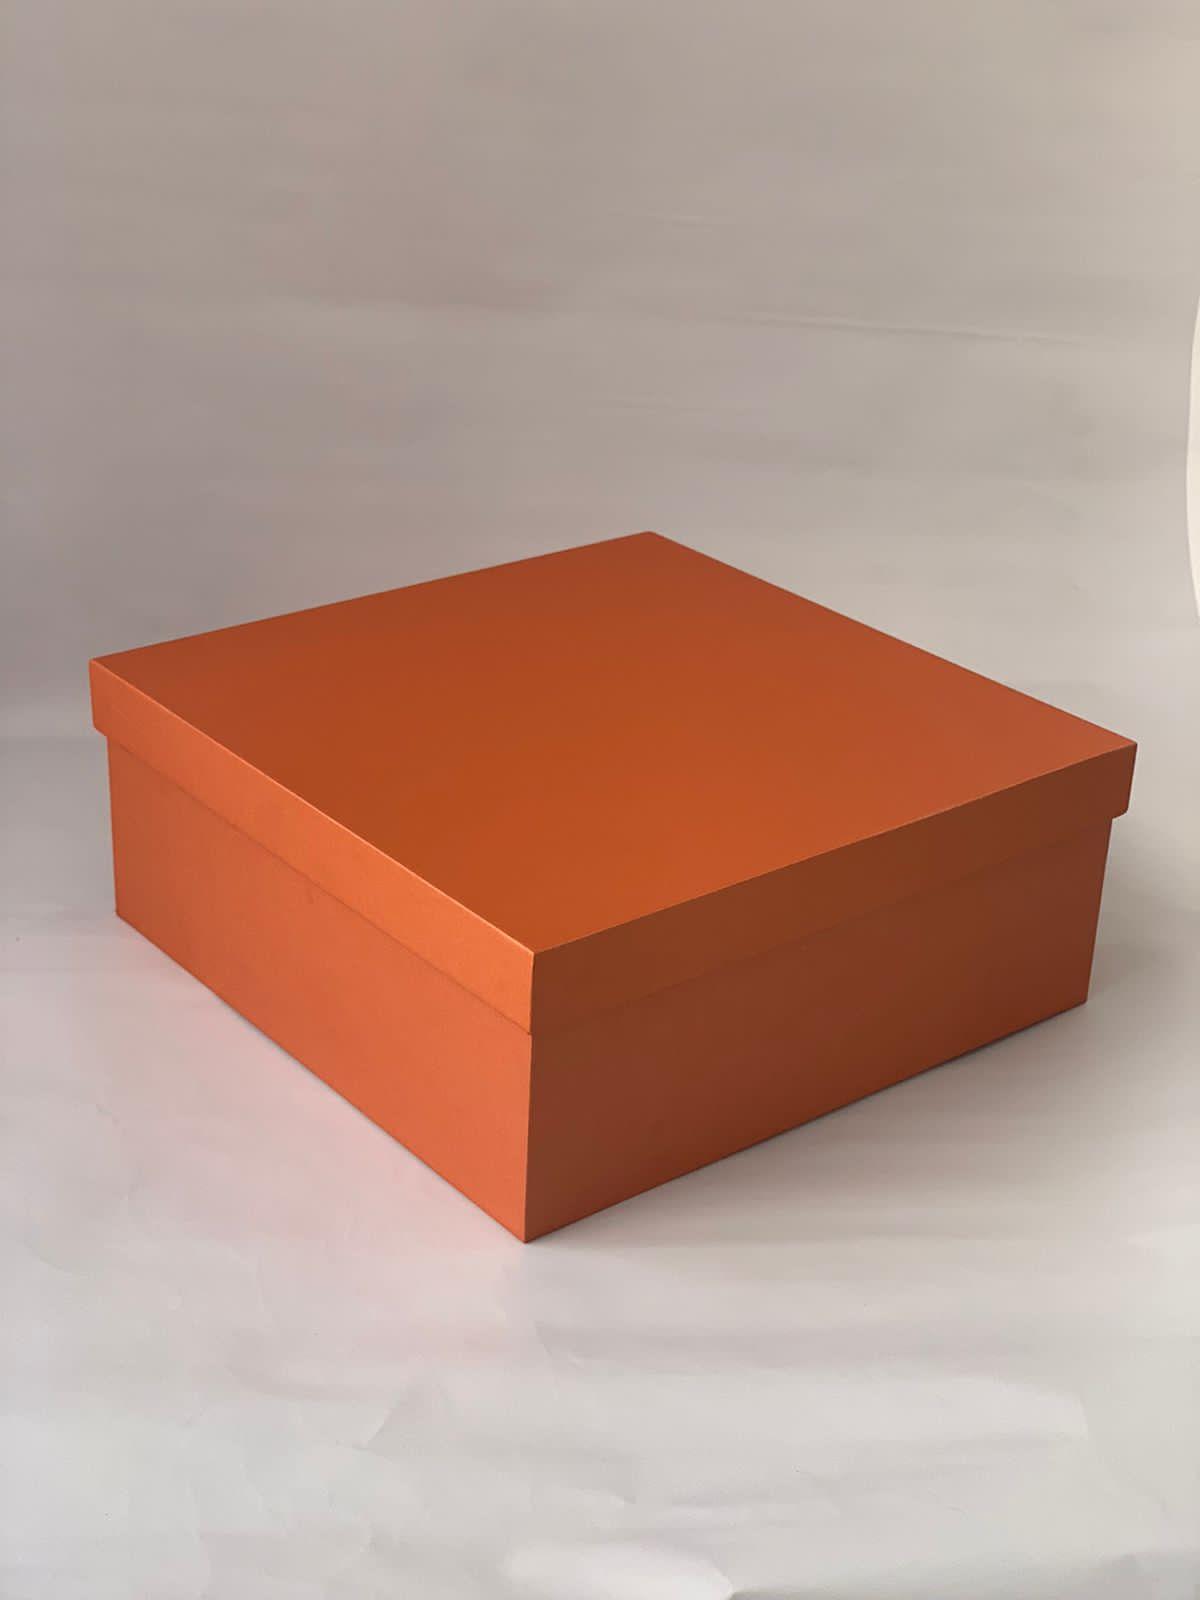 SHOE BOX – 10 x 10 x 4 inches